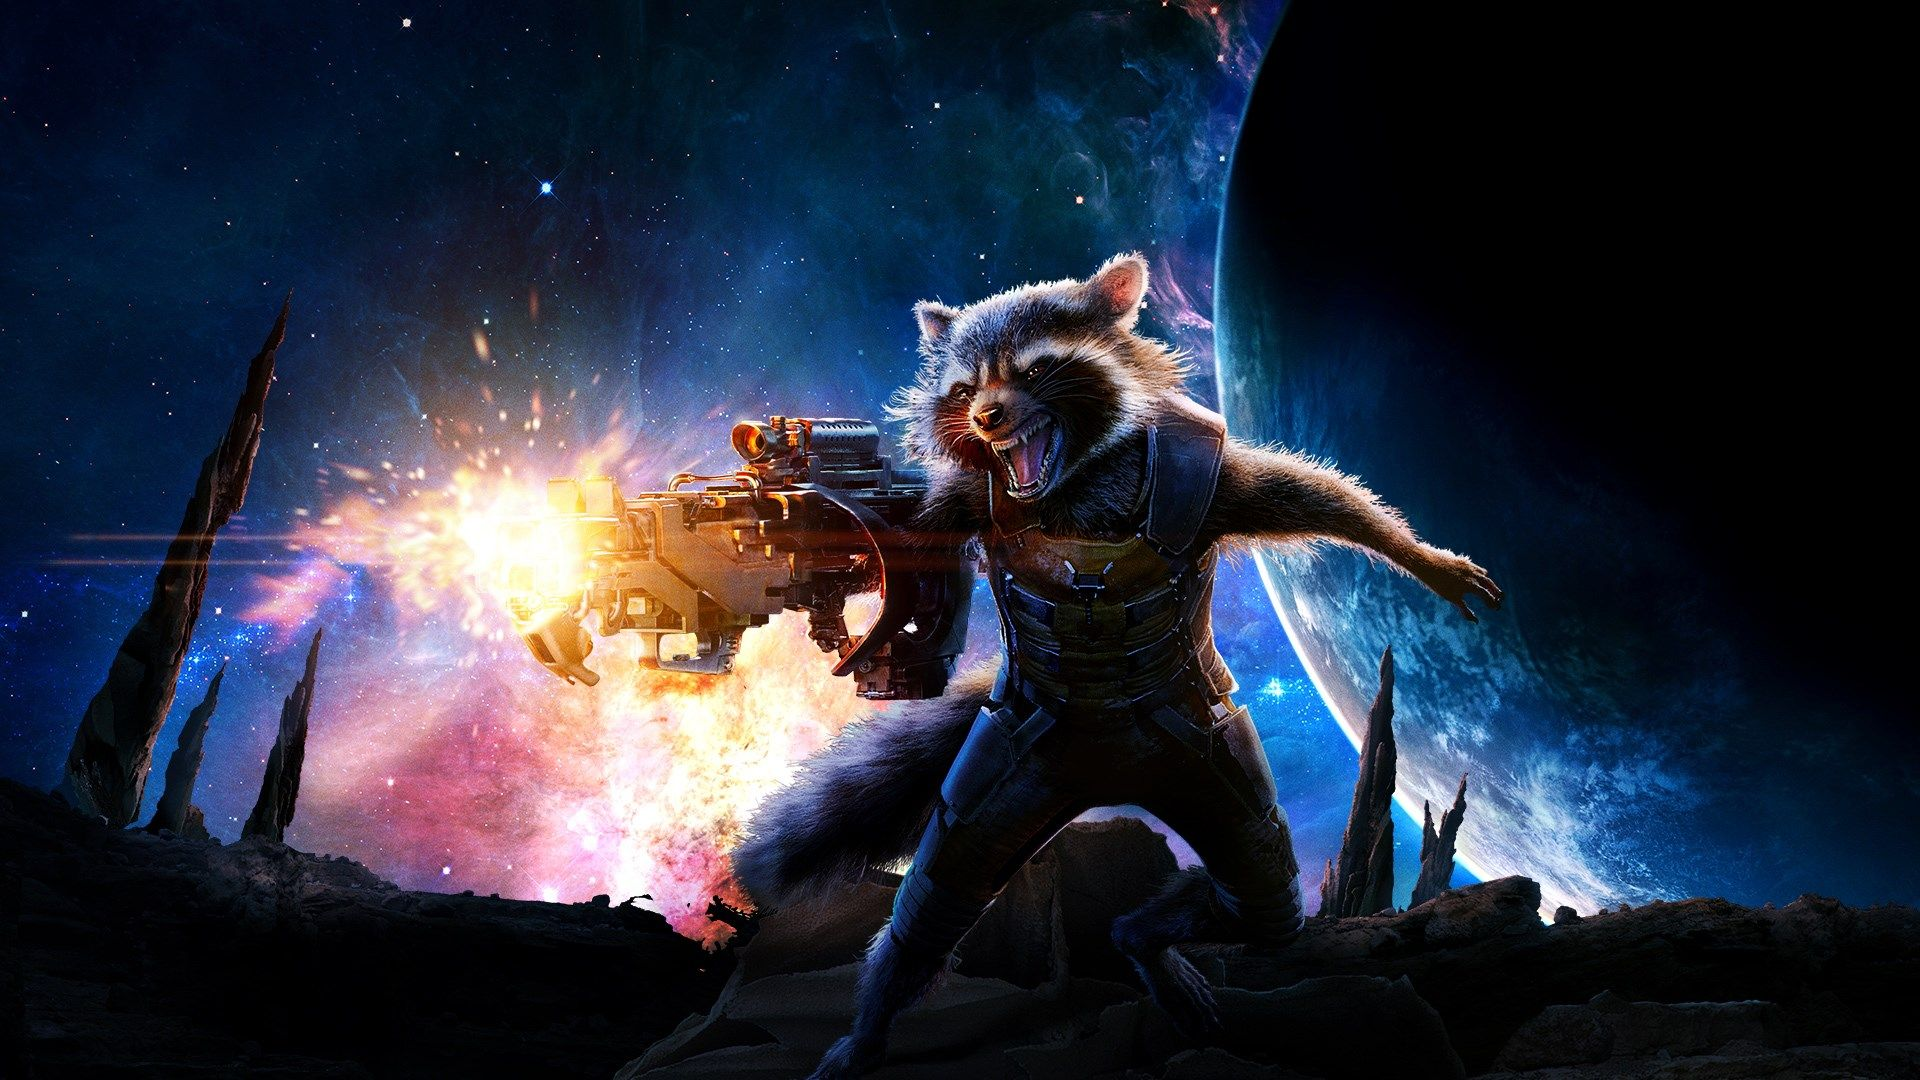 Guardians Of The Galaxy Wallpaper For Desktop Hd 390 KB